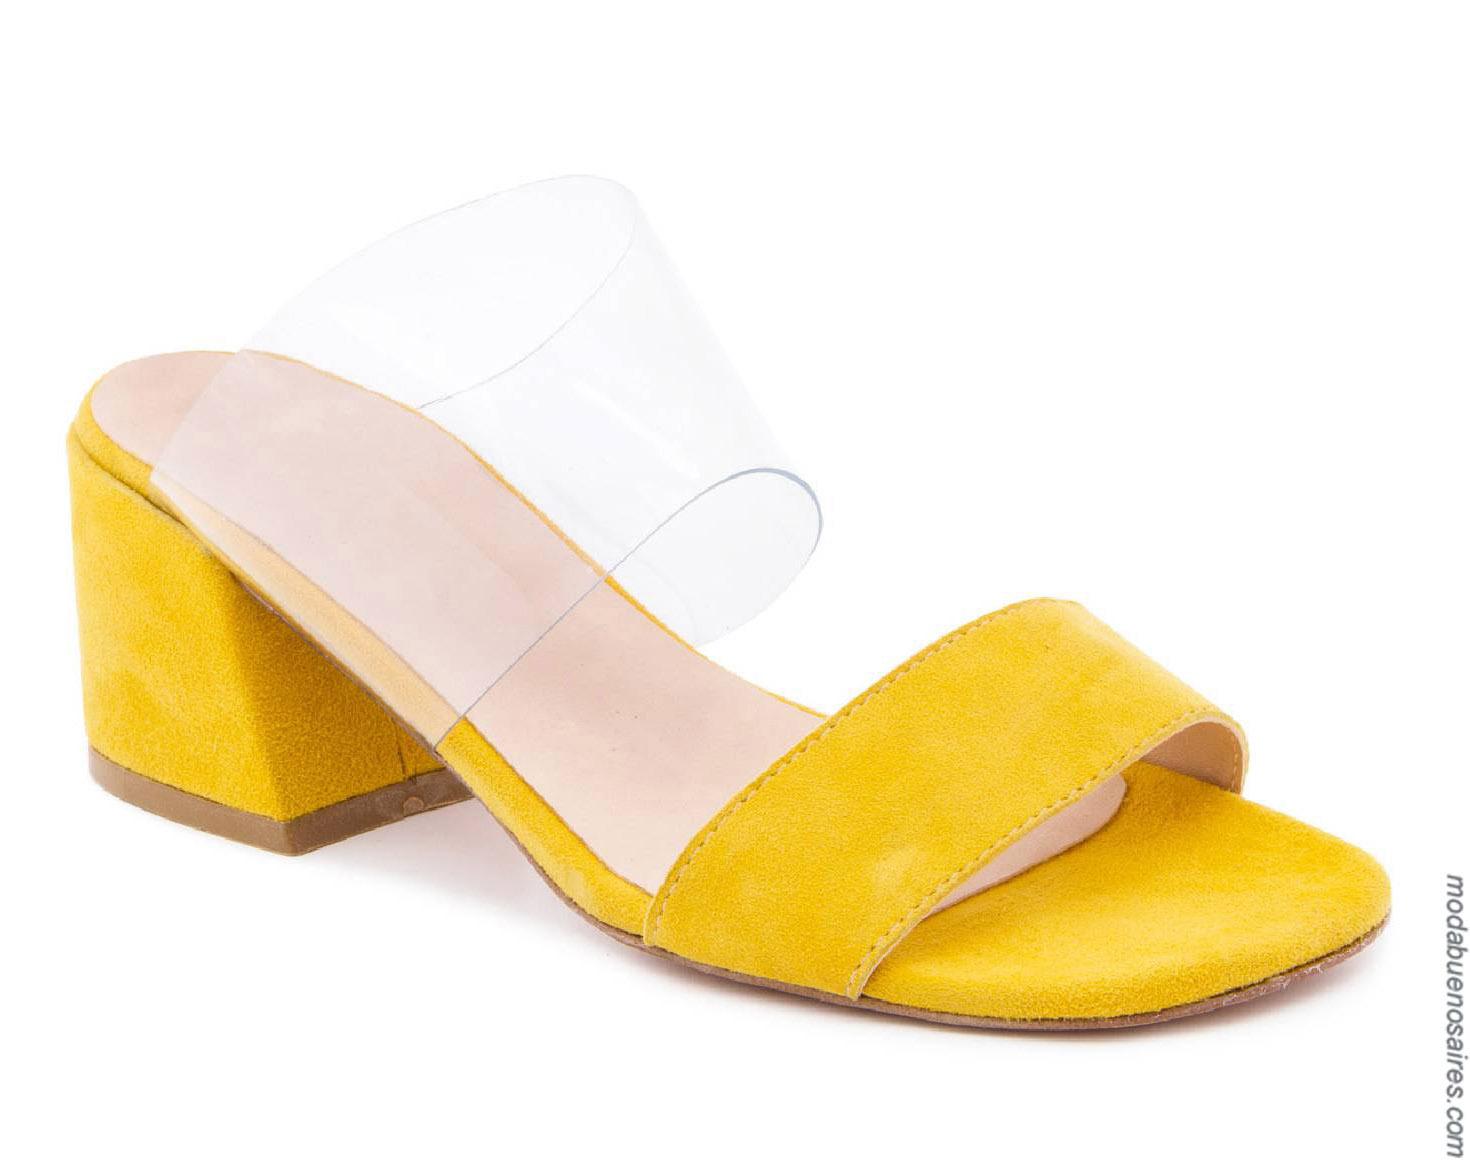 Sandalias primavera verano 2020 de colores para muejr. Moda calzado femenino primavera verano 2020.